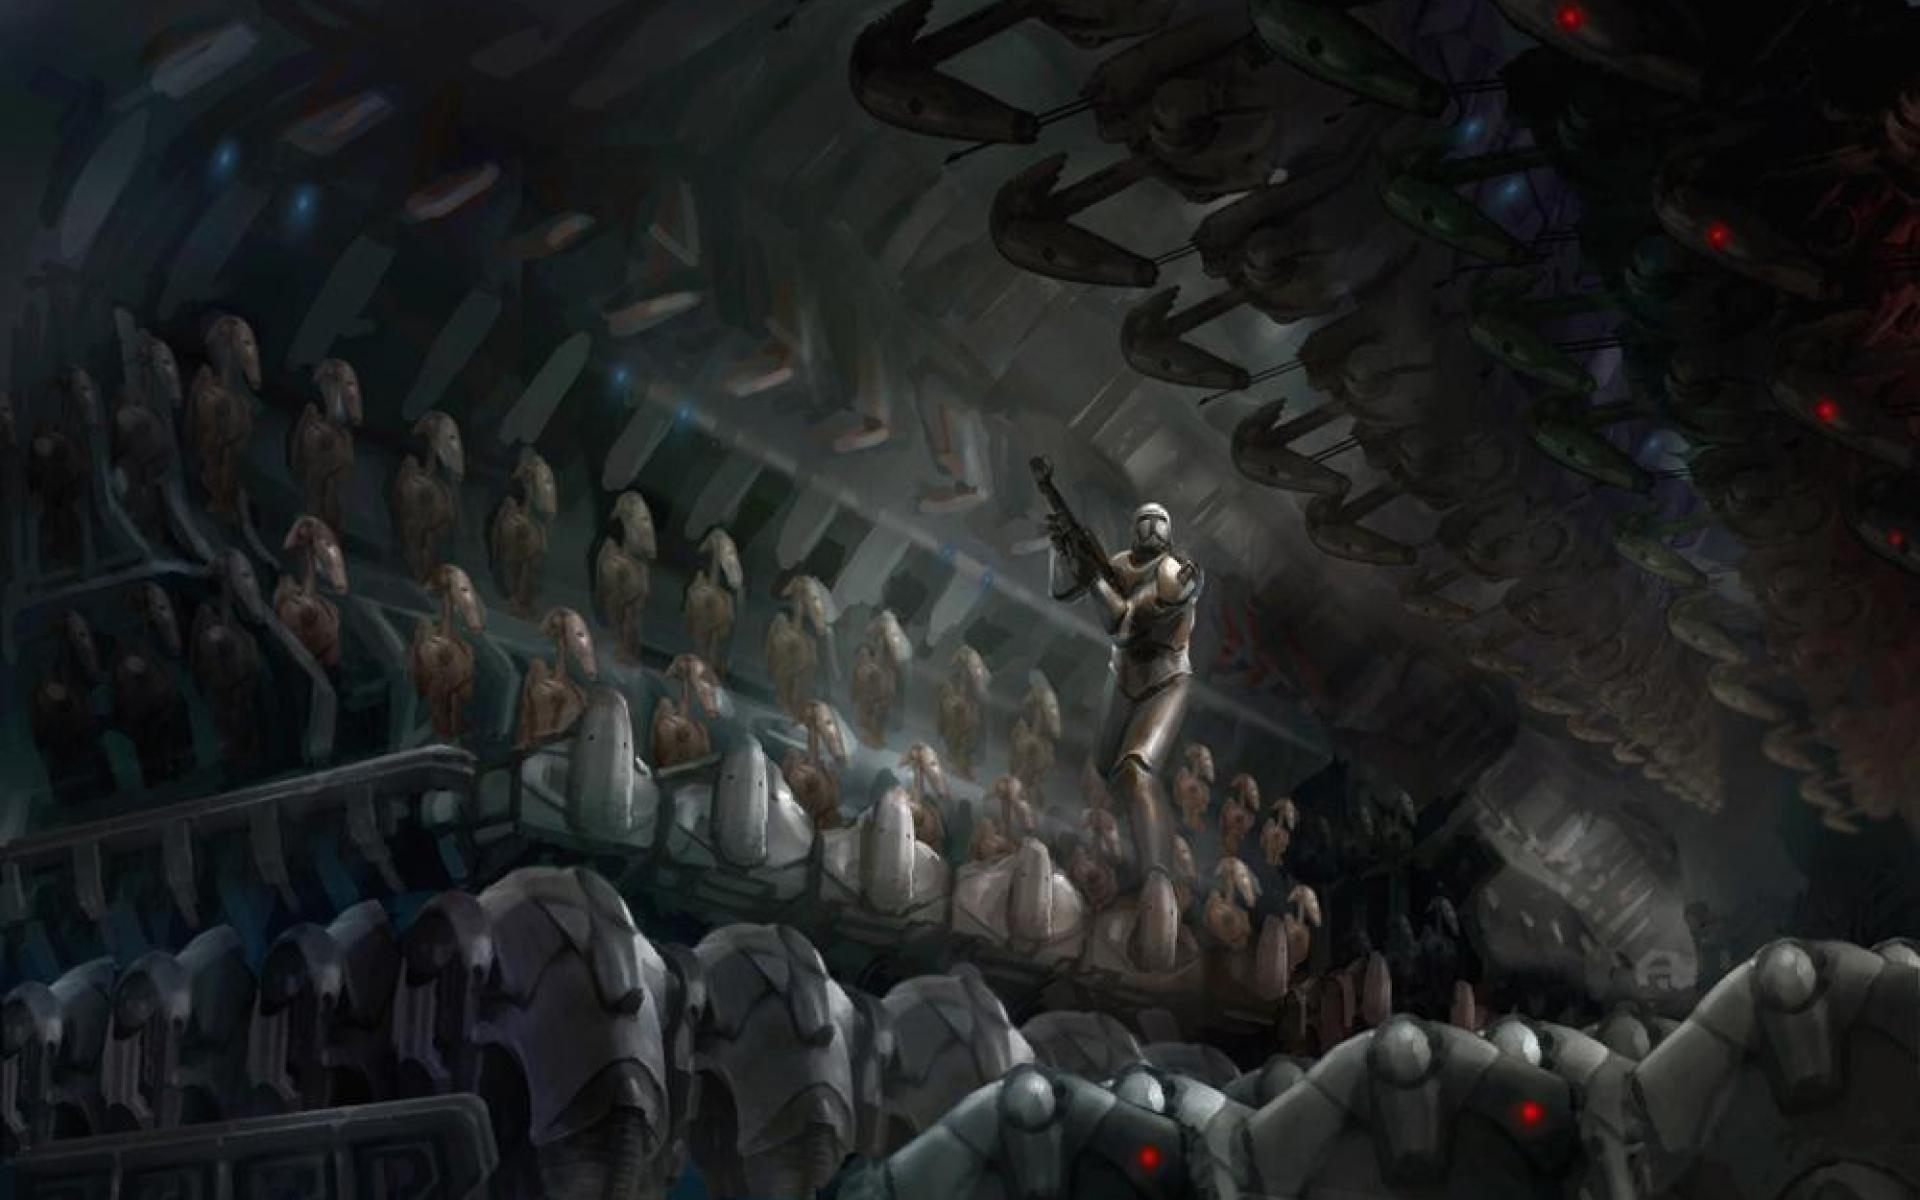 Star Wars Clone Wars Wallpaper 64 Pictures